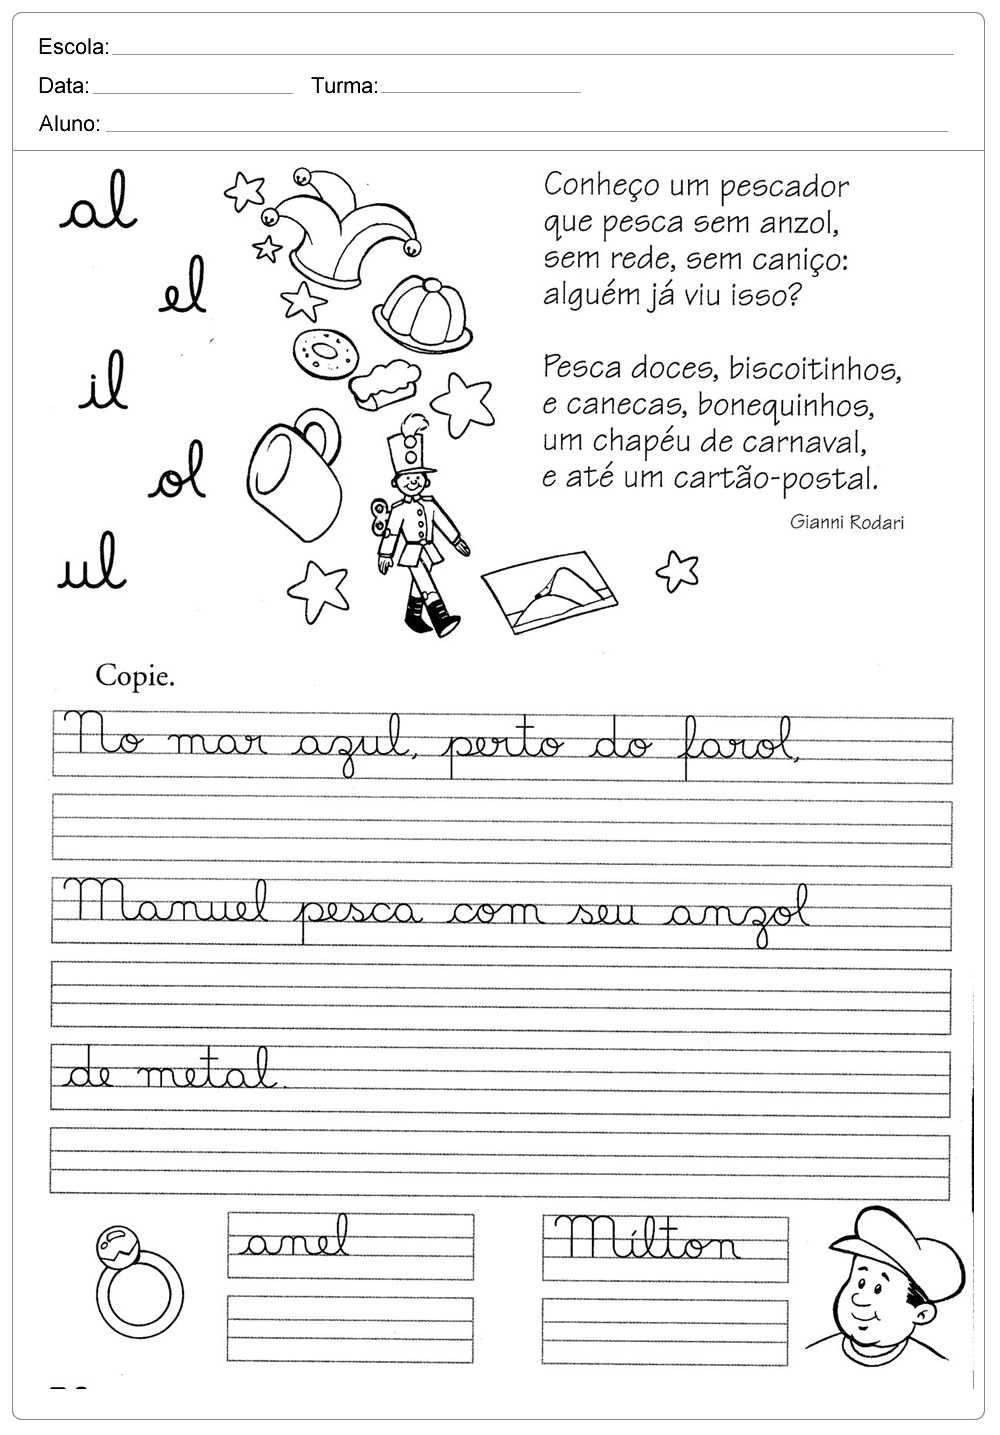 atividade-de-caligrafia-al-el-il-ol-ul